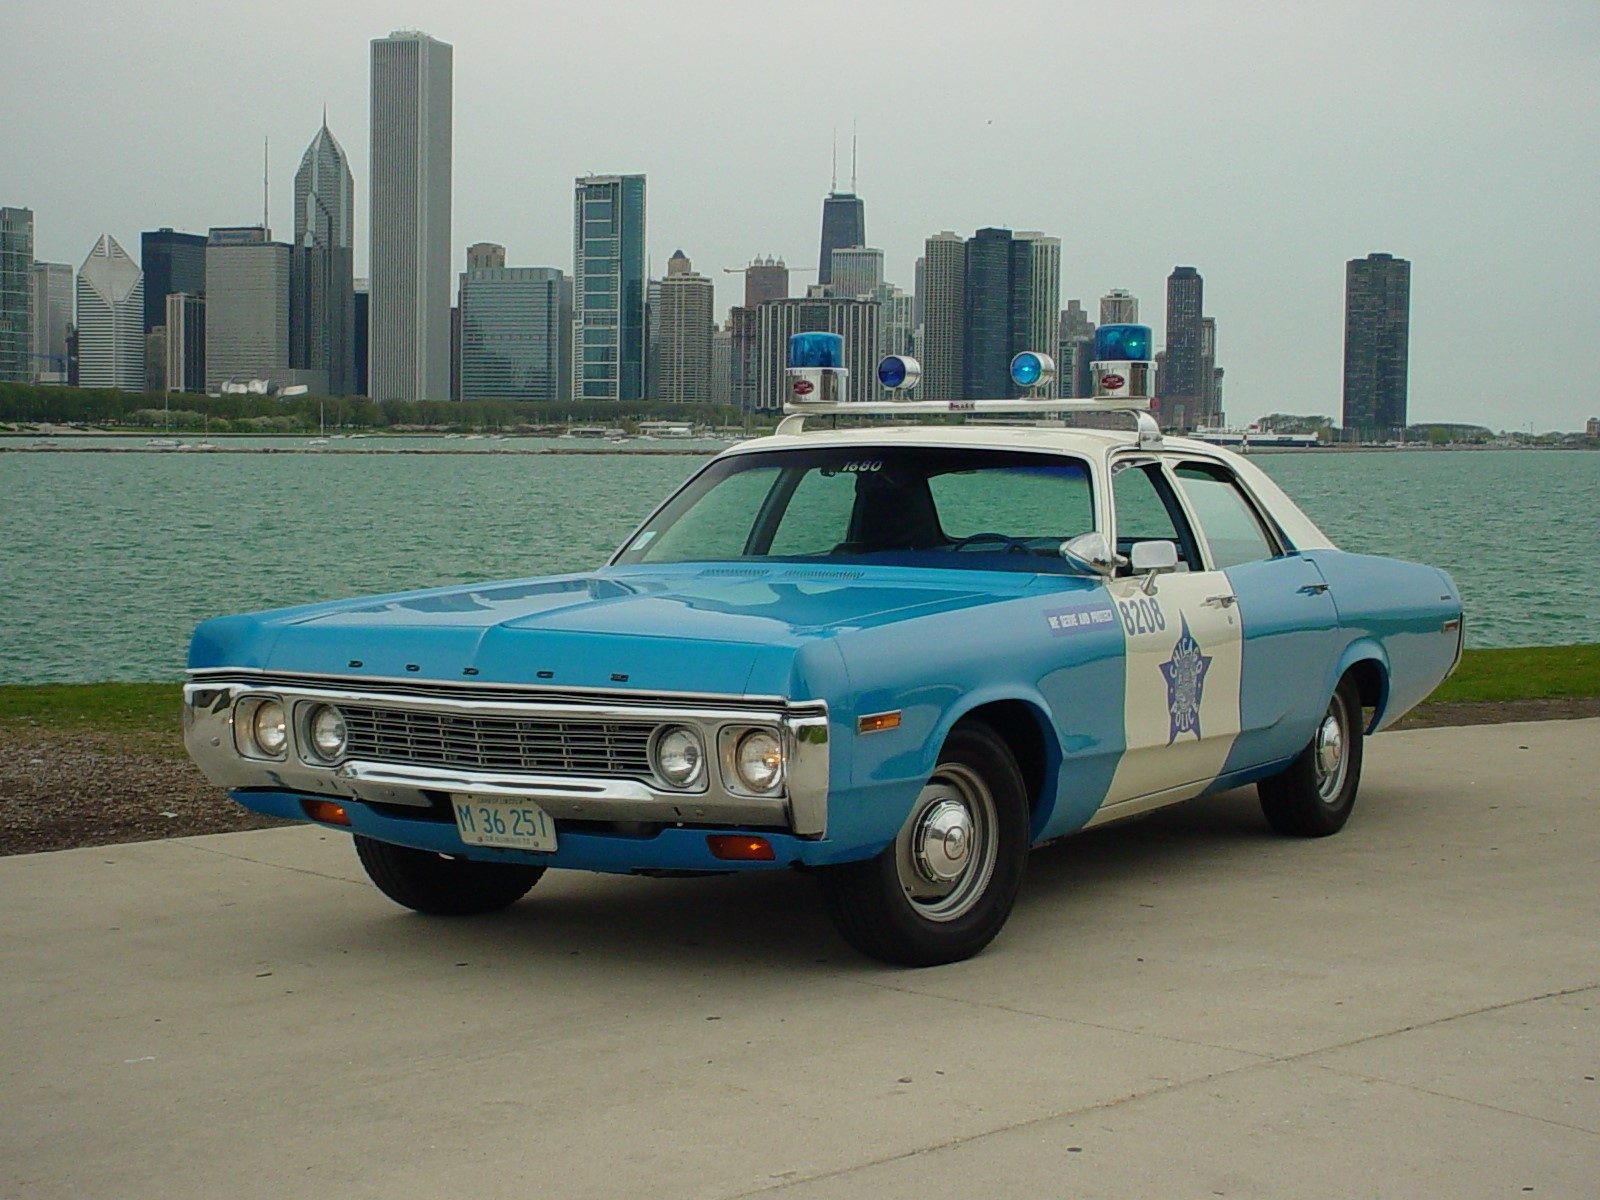 Police car 8208